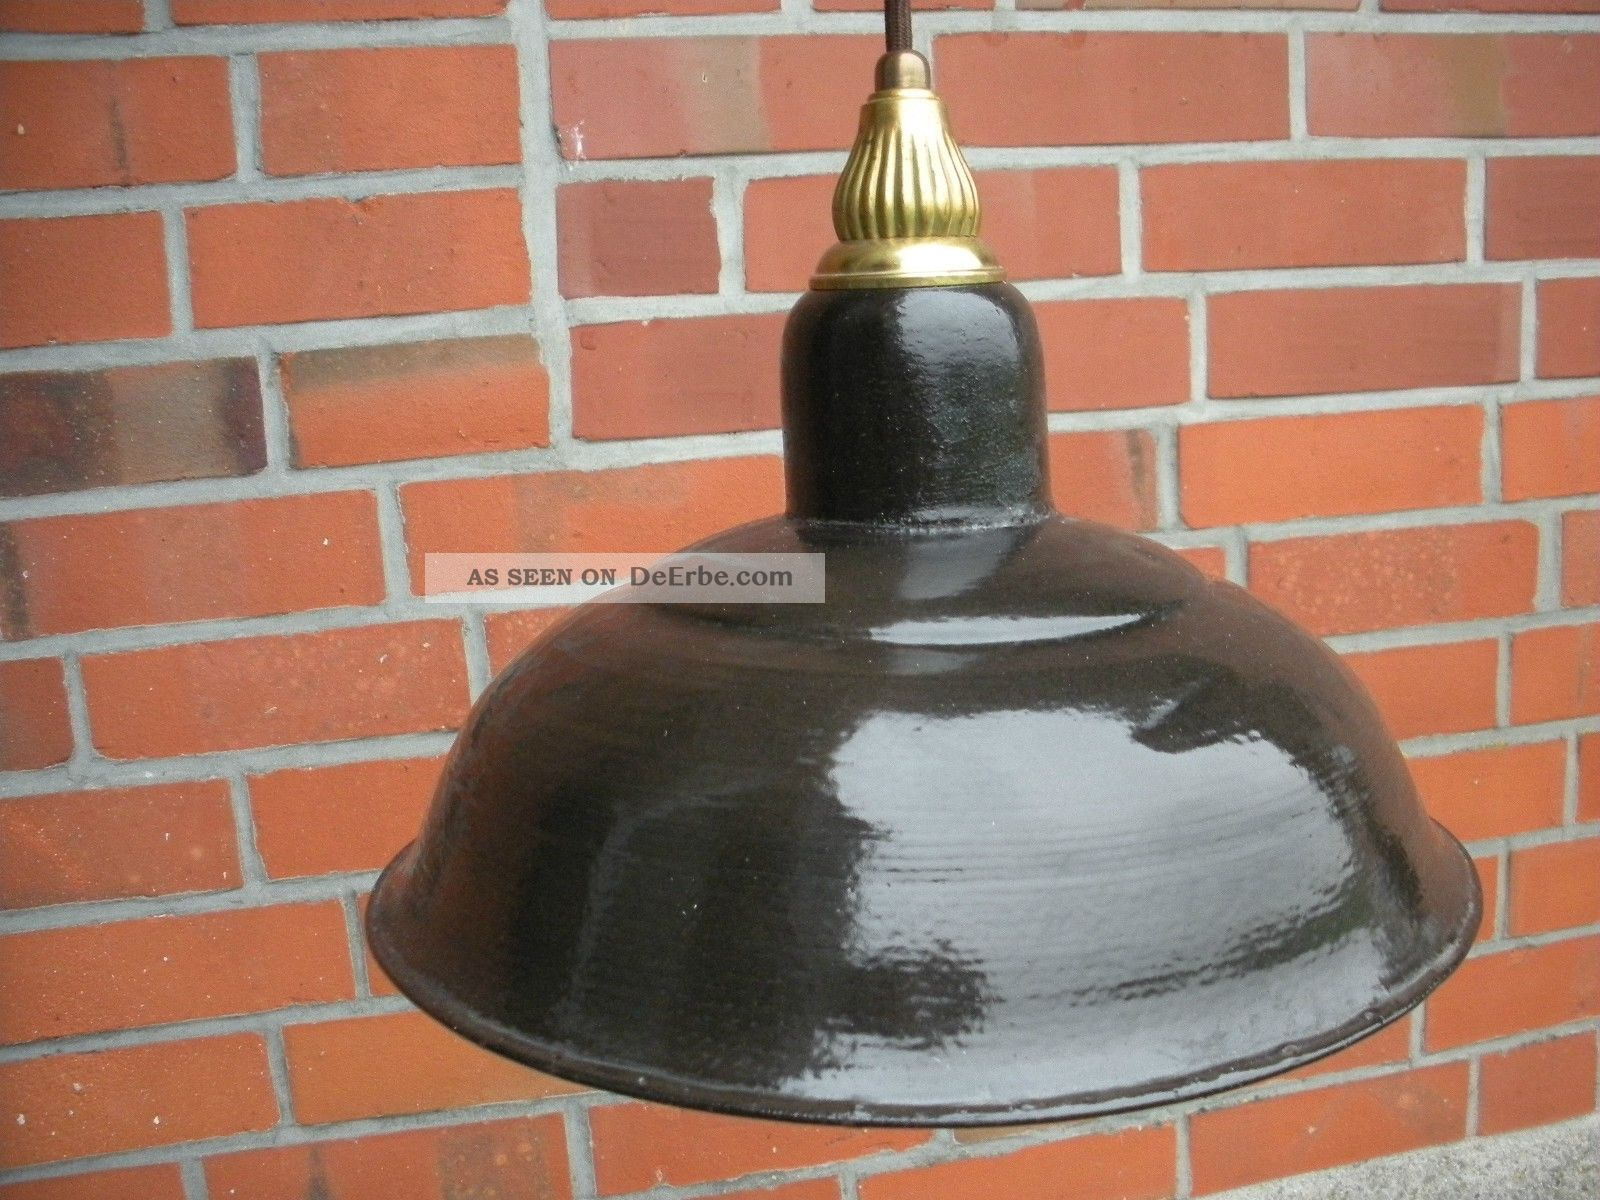 alte bauhaus art deco lampe deckenlampe emaille messing fassung loft industrie. Black Bedroom Furniture Sets. Home Design Ideas